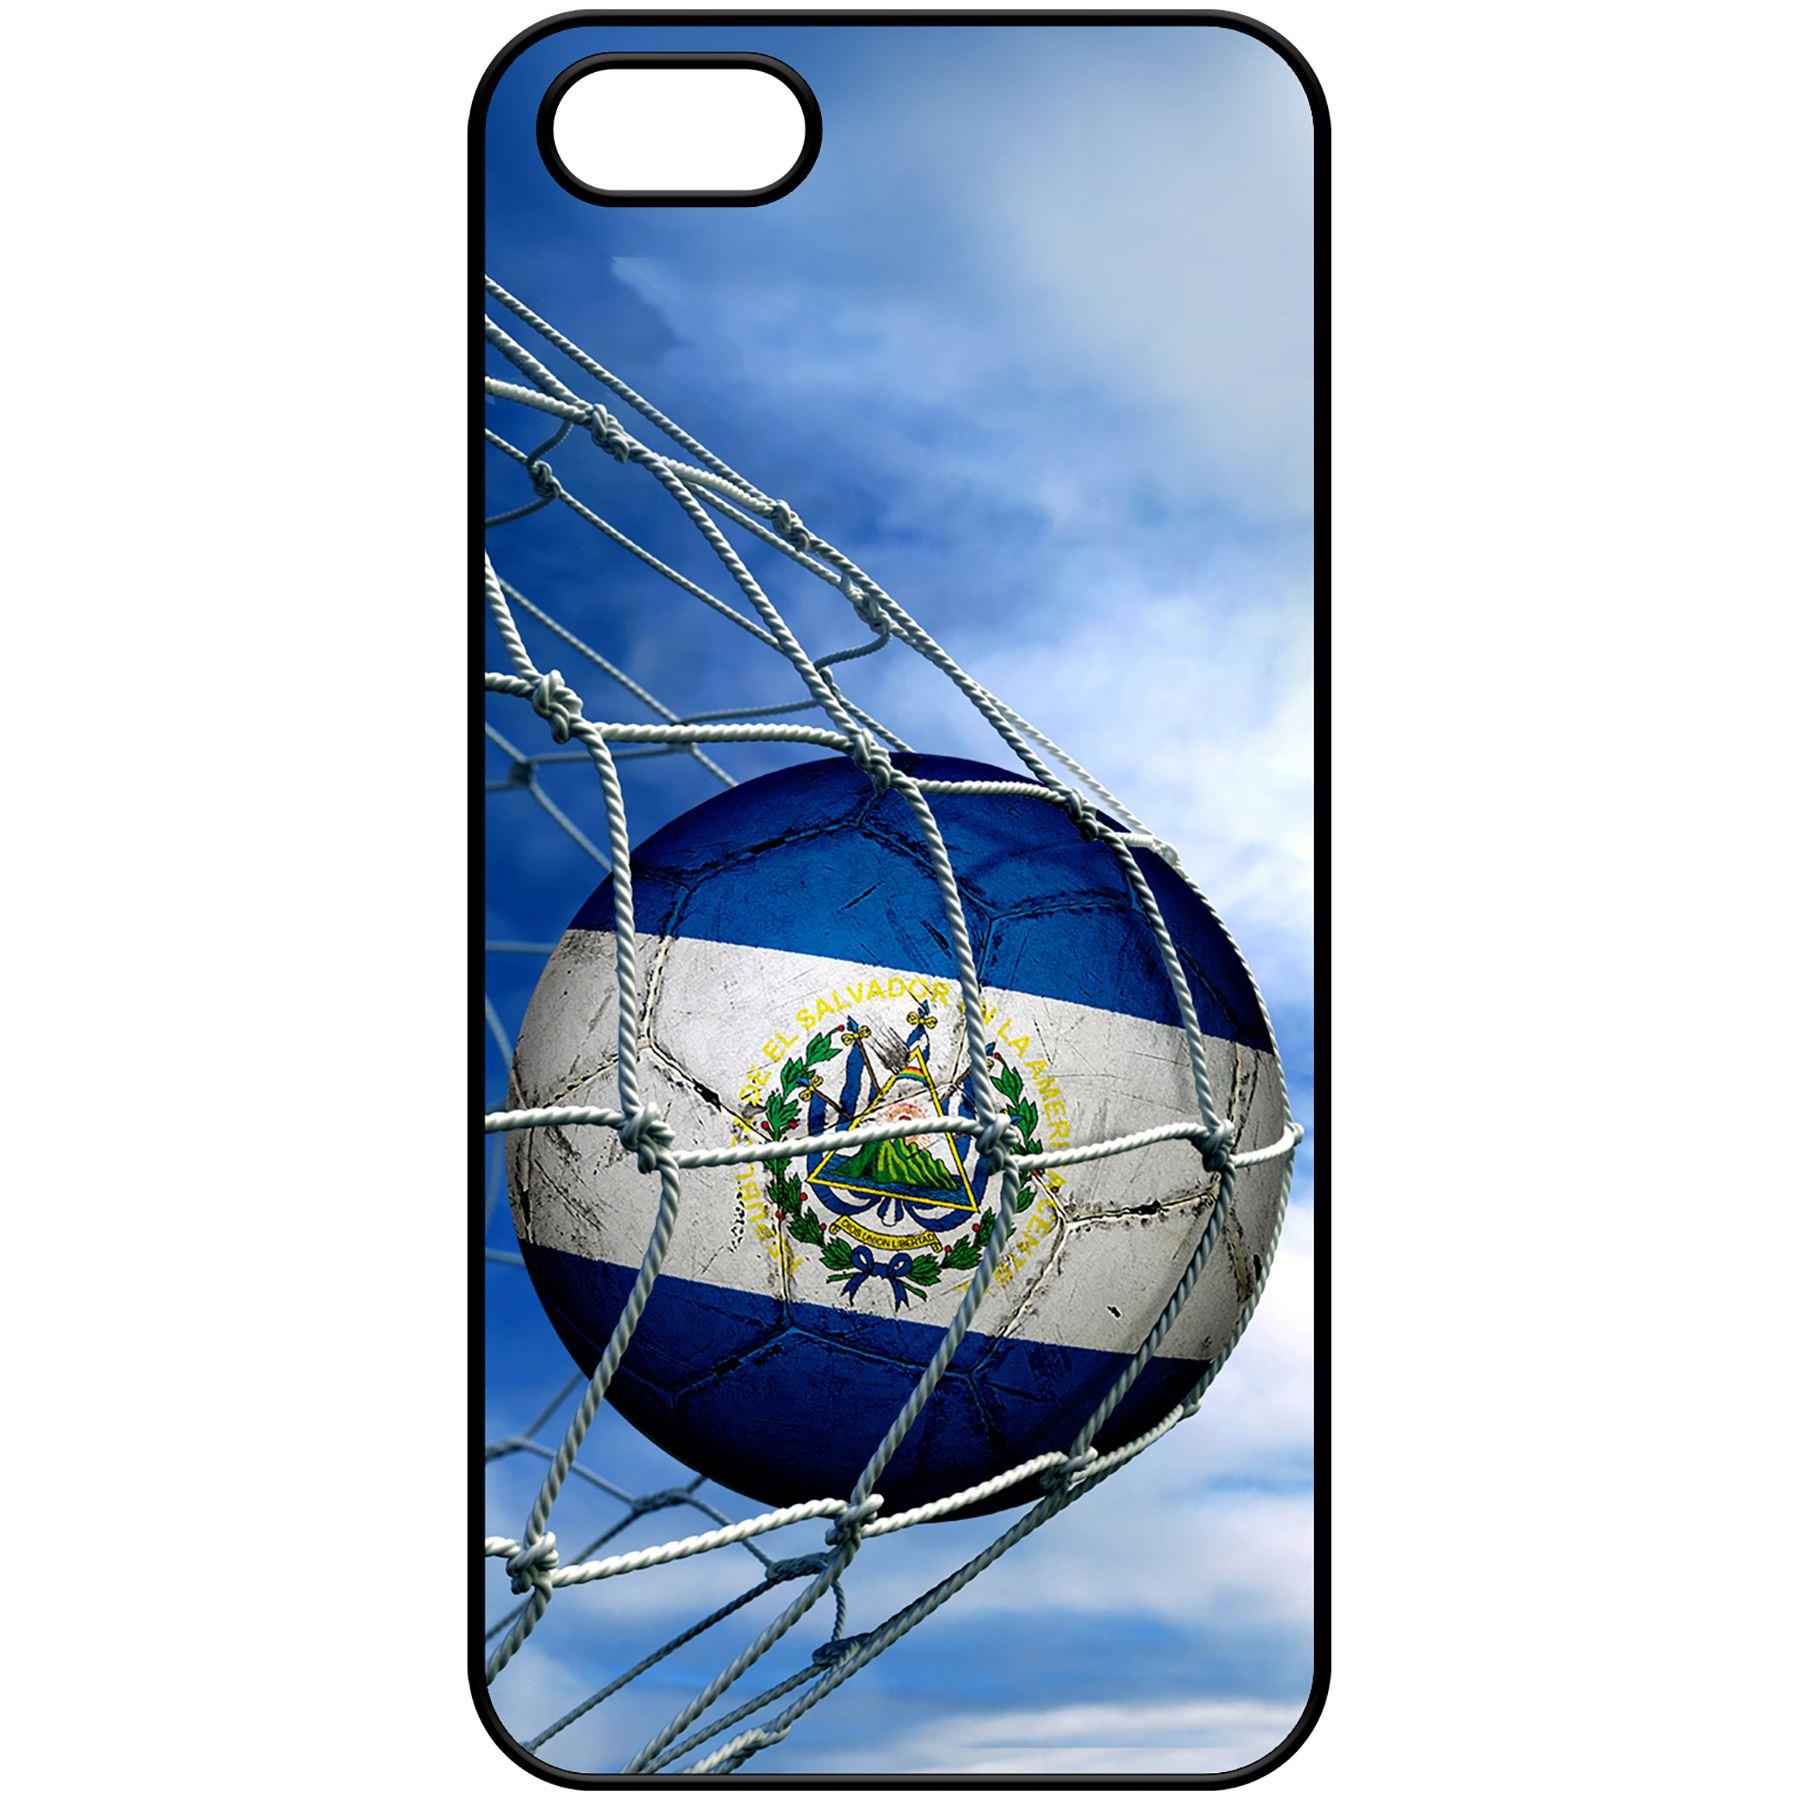 Case for iPhone 5 / 5S - Flag of El Salvador - Choose your design